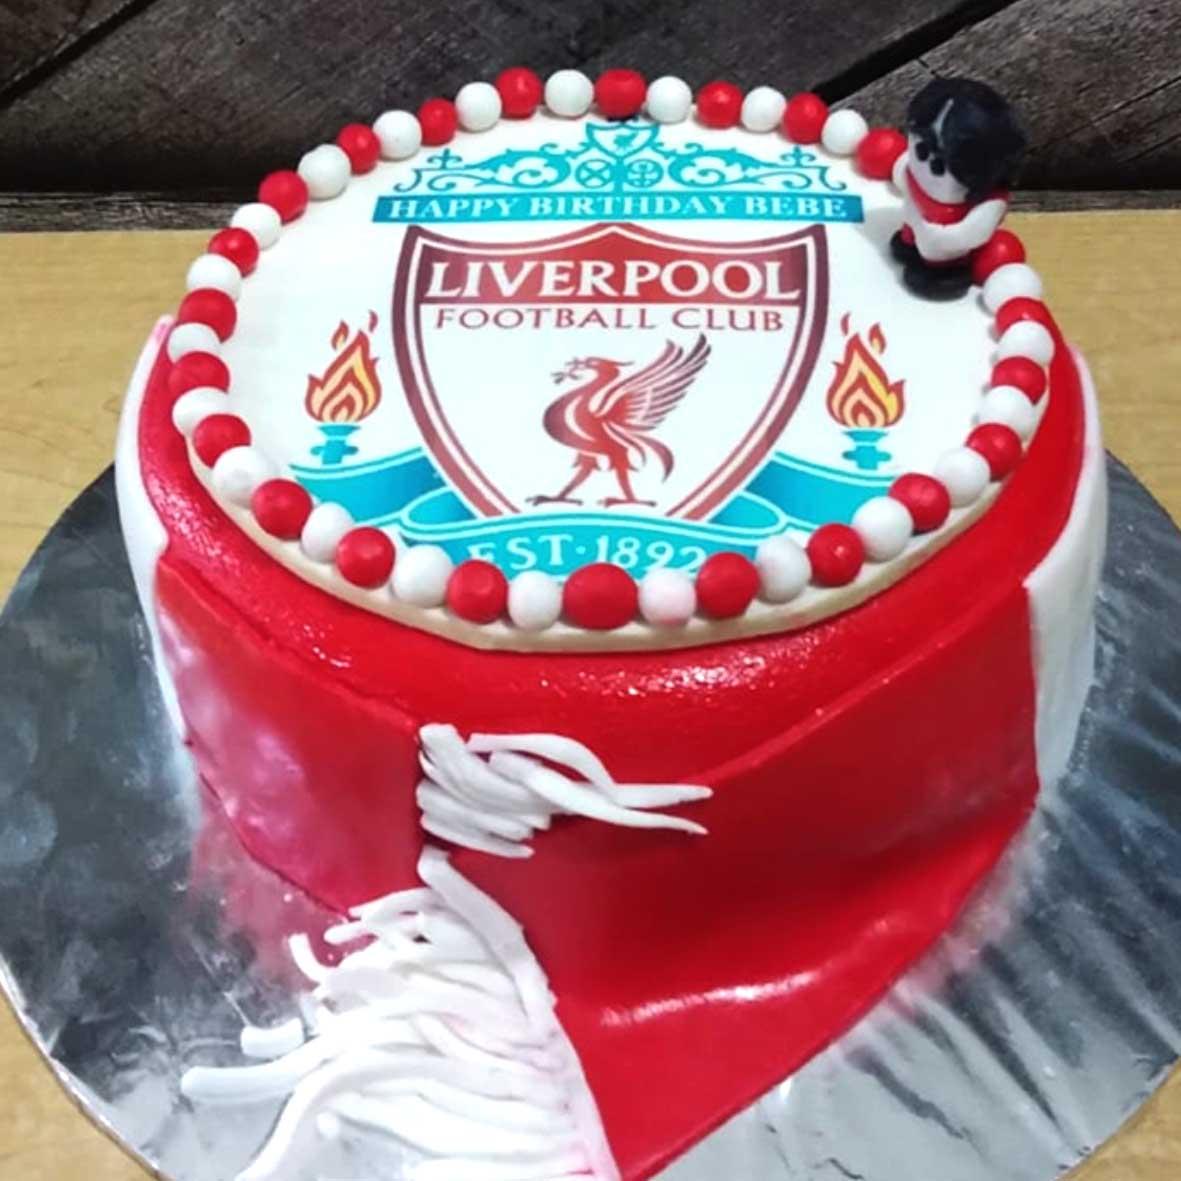 The Reds Tart Jakarta Pesan Online Delivery Indonesia Prestisa